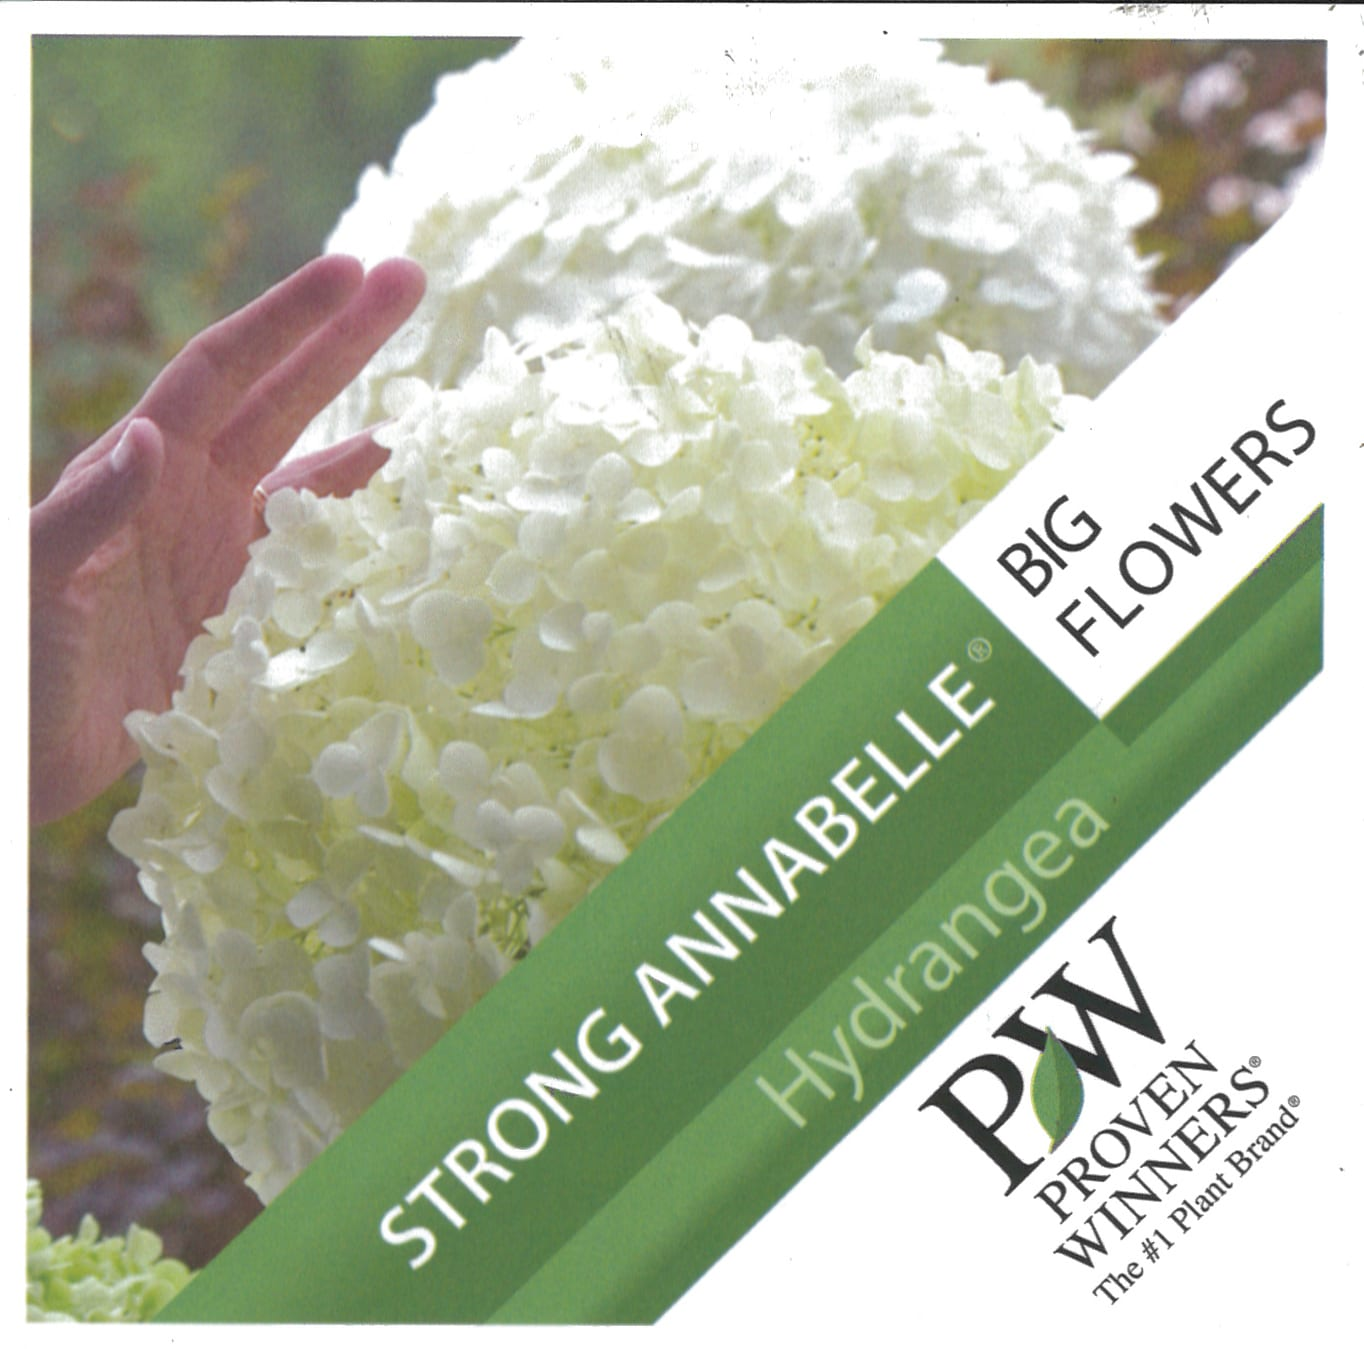 Hydrangea Proven Winners 'Strong Annabelle' etiket voorzijde | Plants By Nature - gespecialiseerd in hydrangea